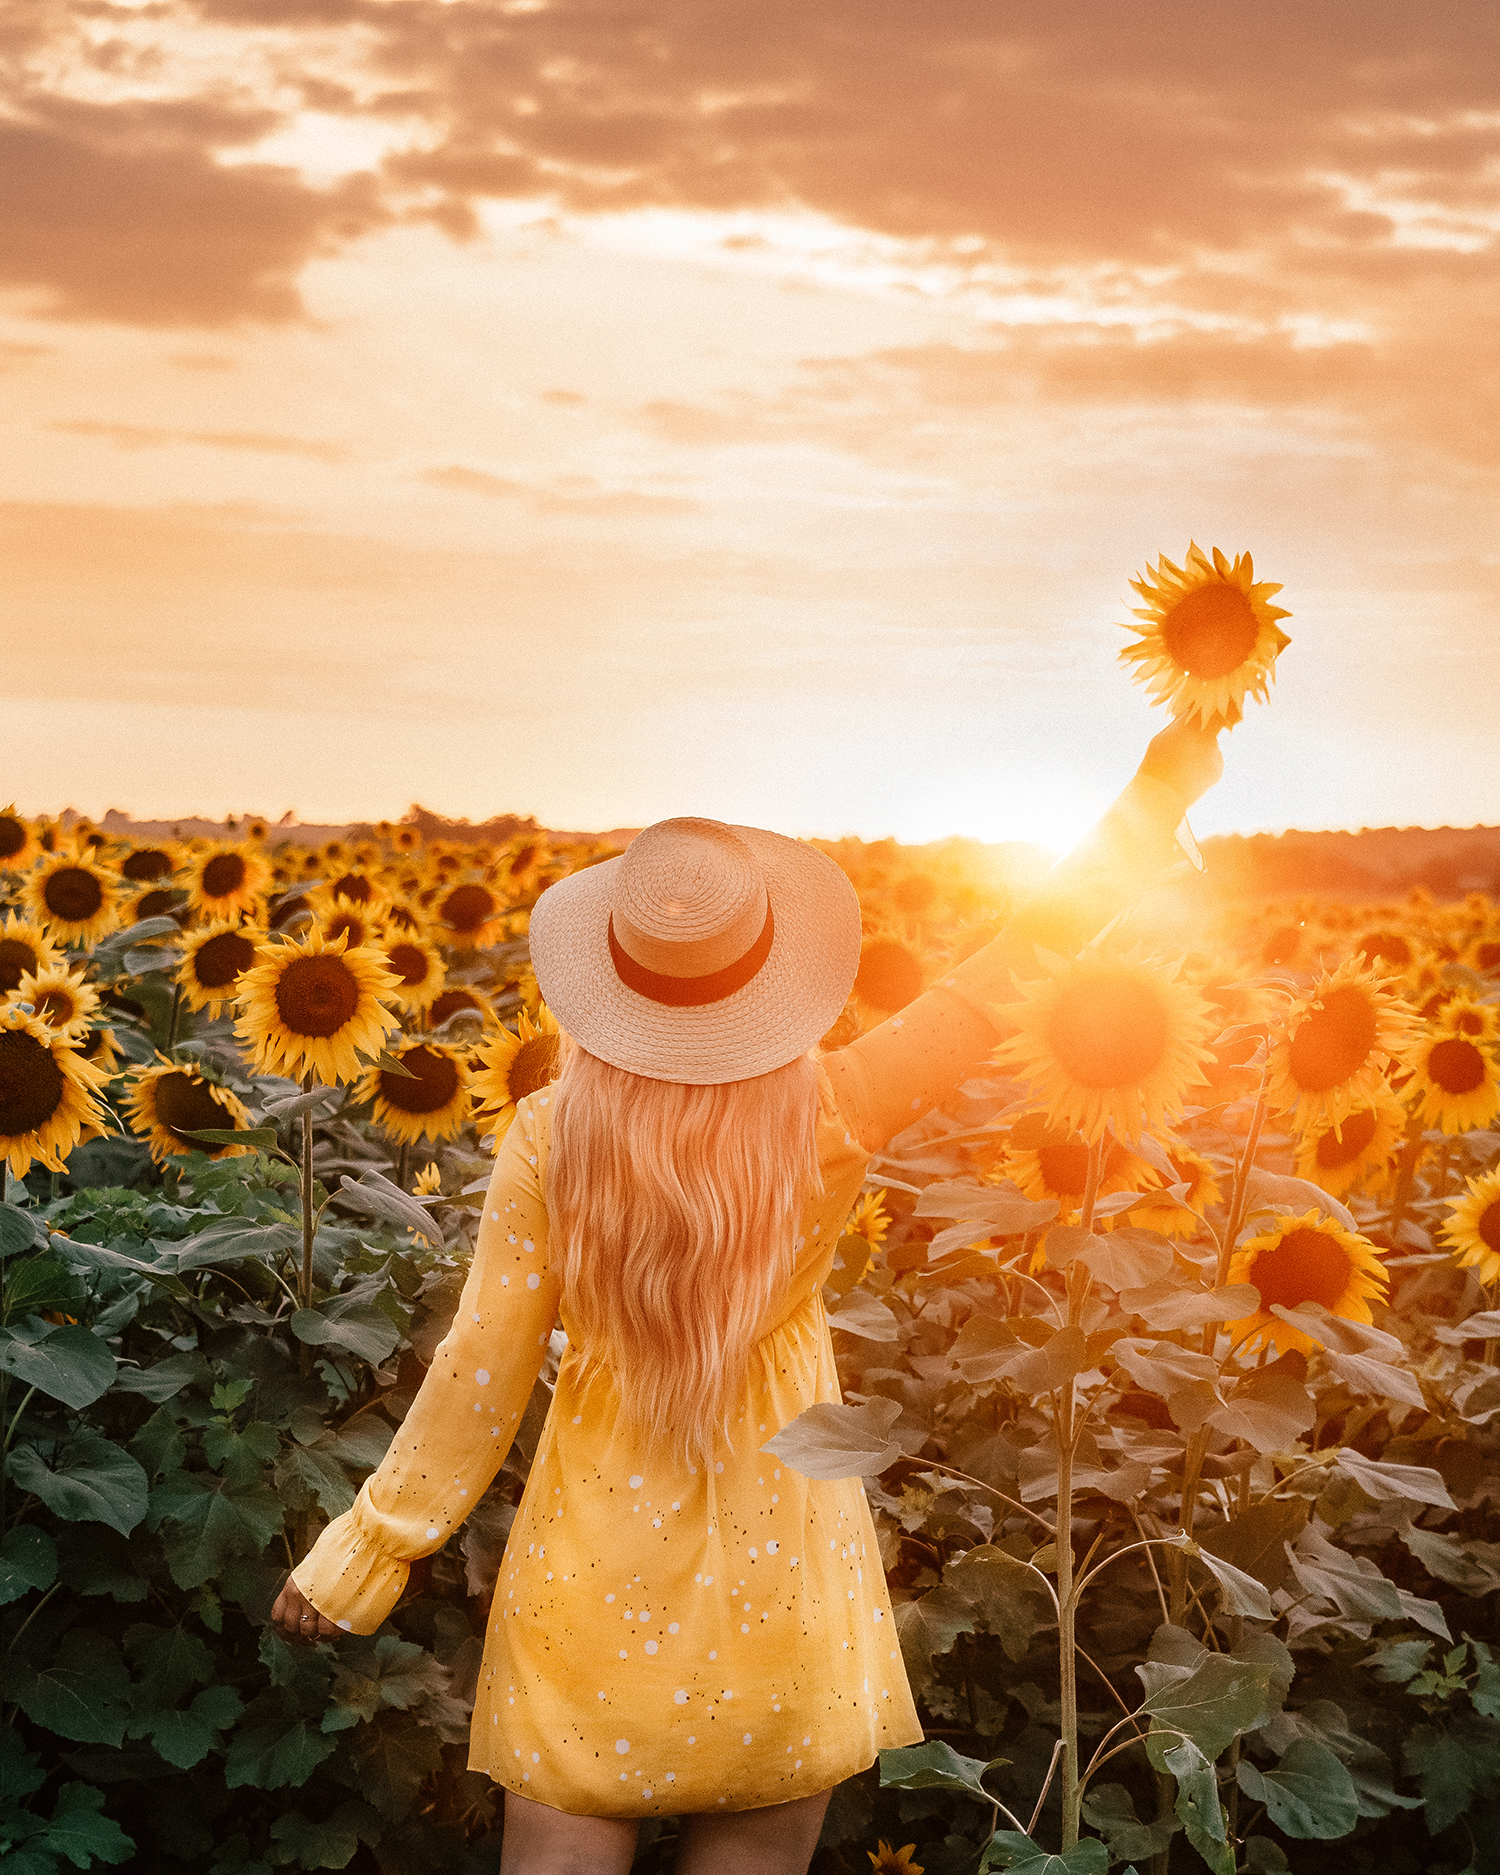 Sunflower field in sunset in Karanac | Things to Do in Slavonia, Croatia